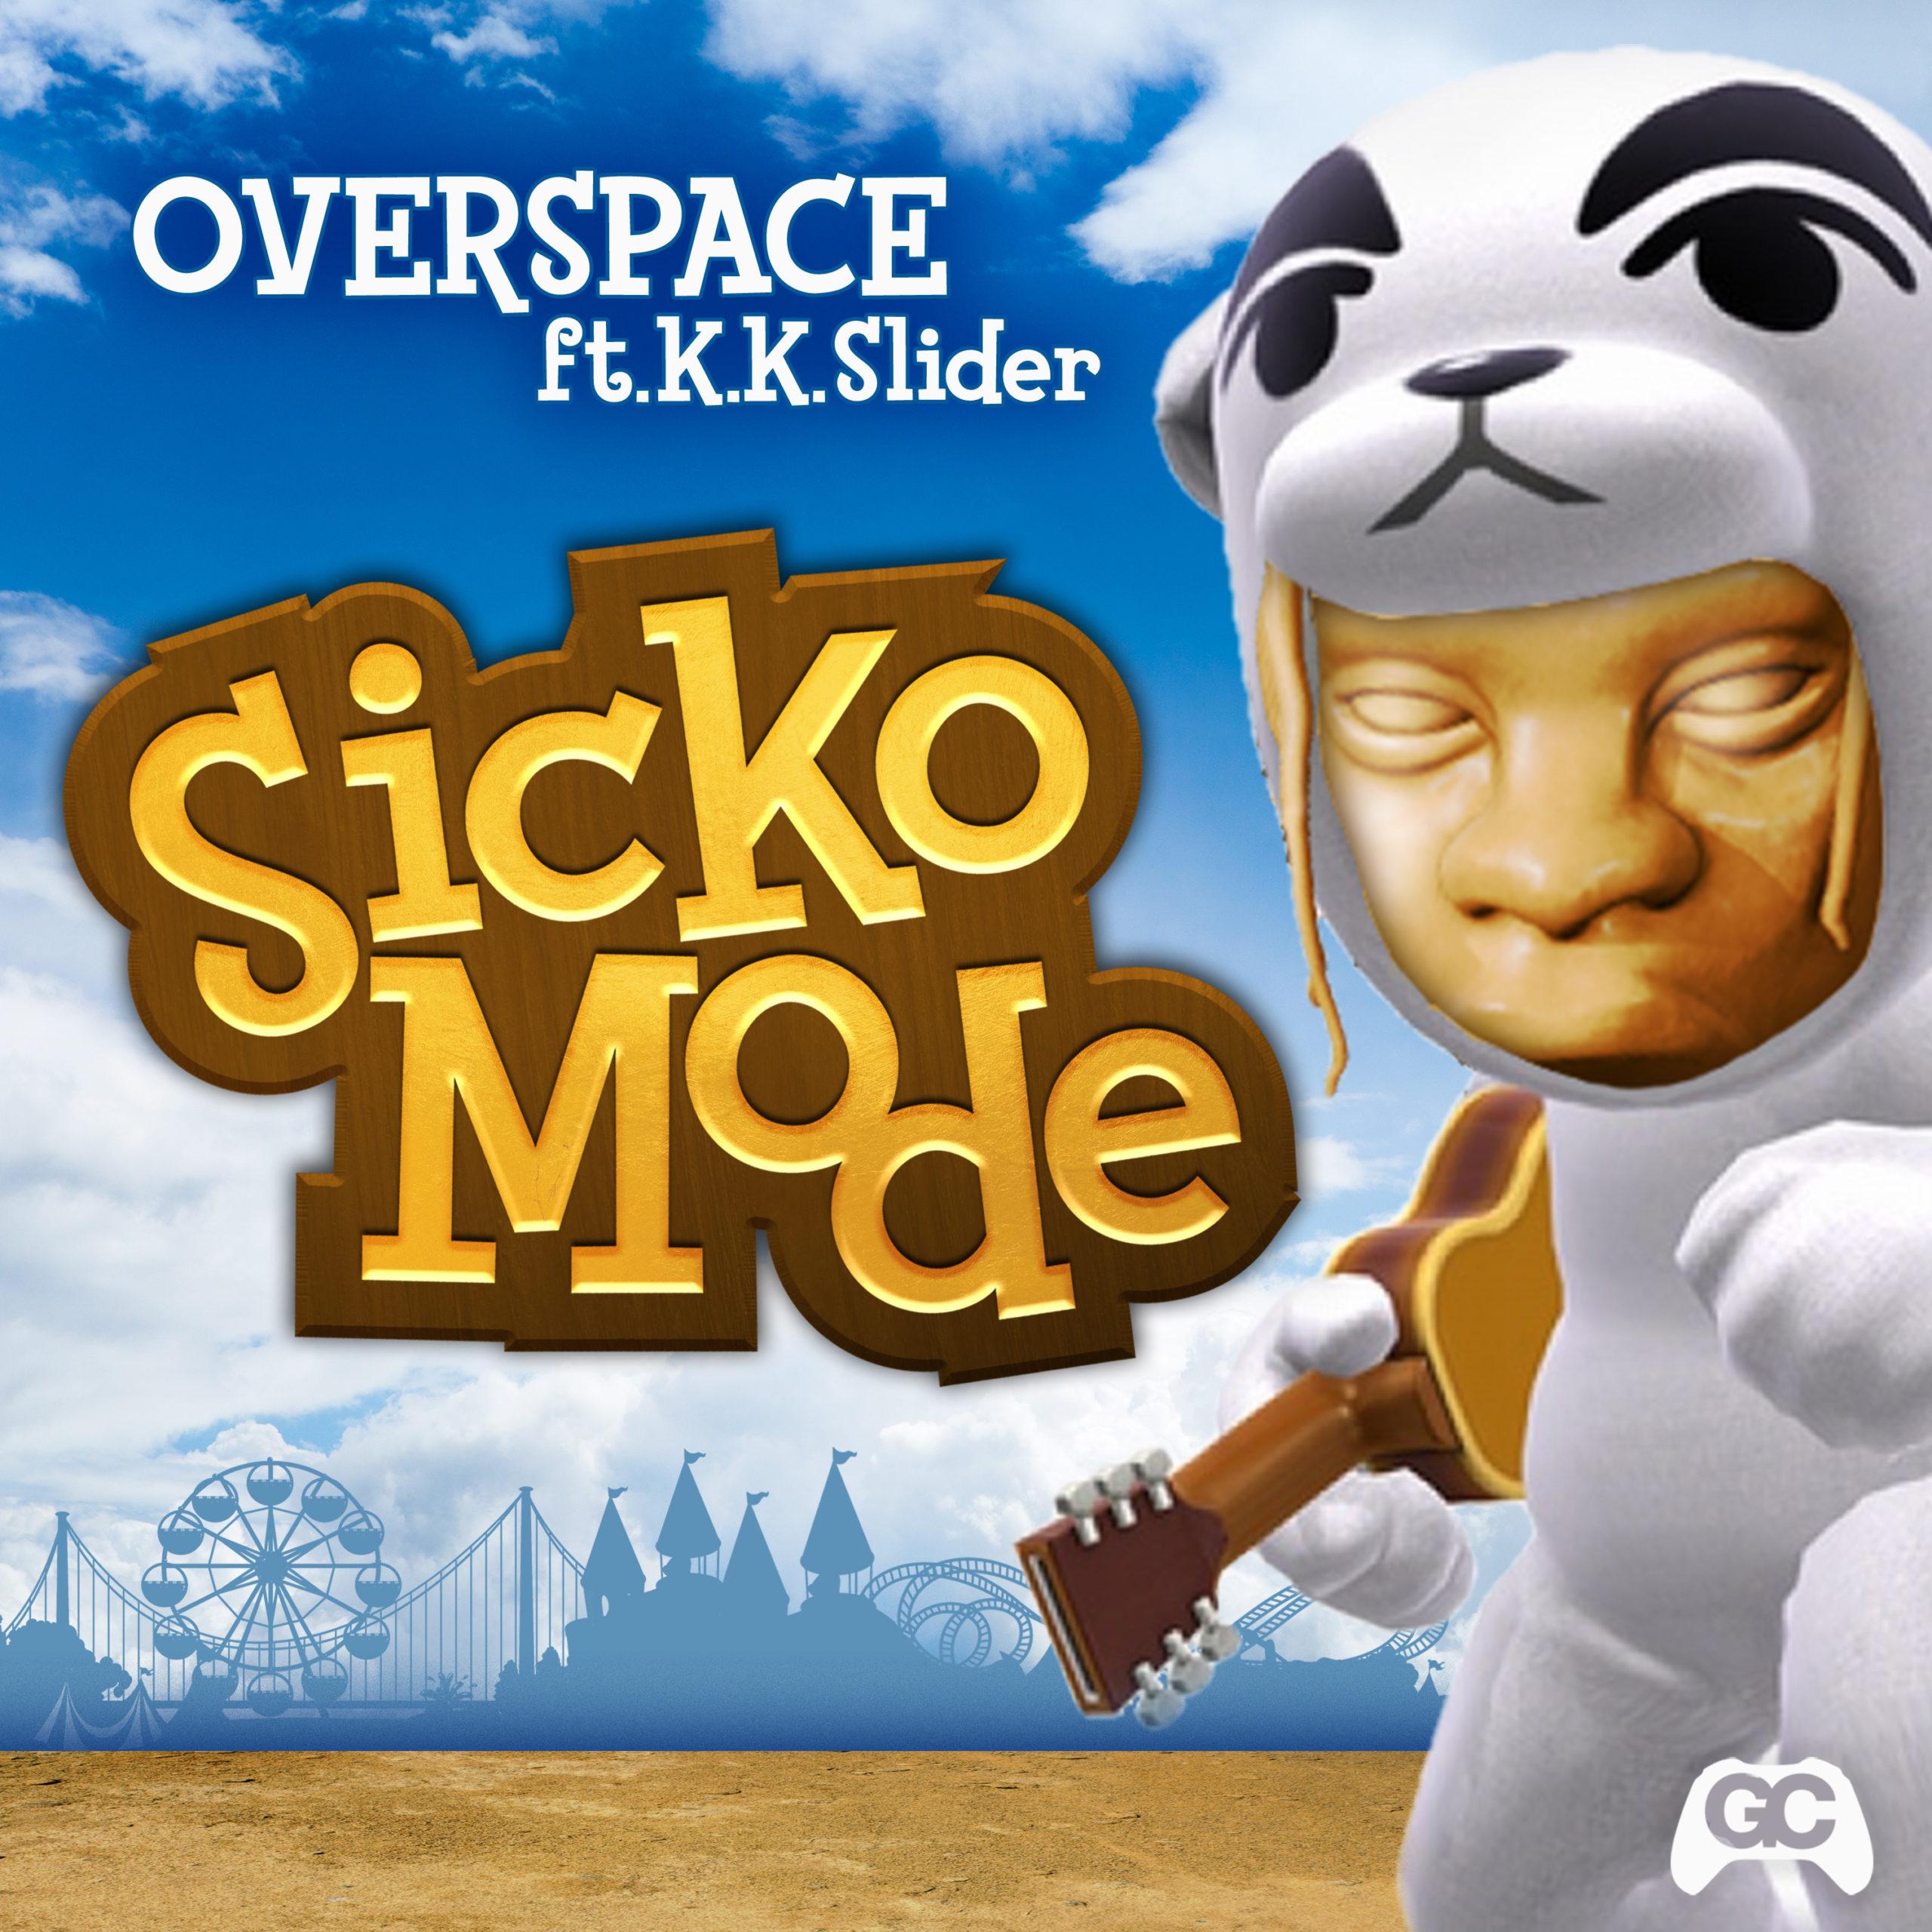 Overspace – Sicko Mode (ft. K.K. Slider)